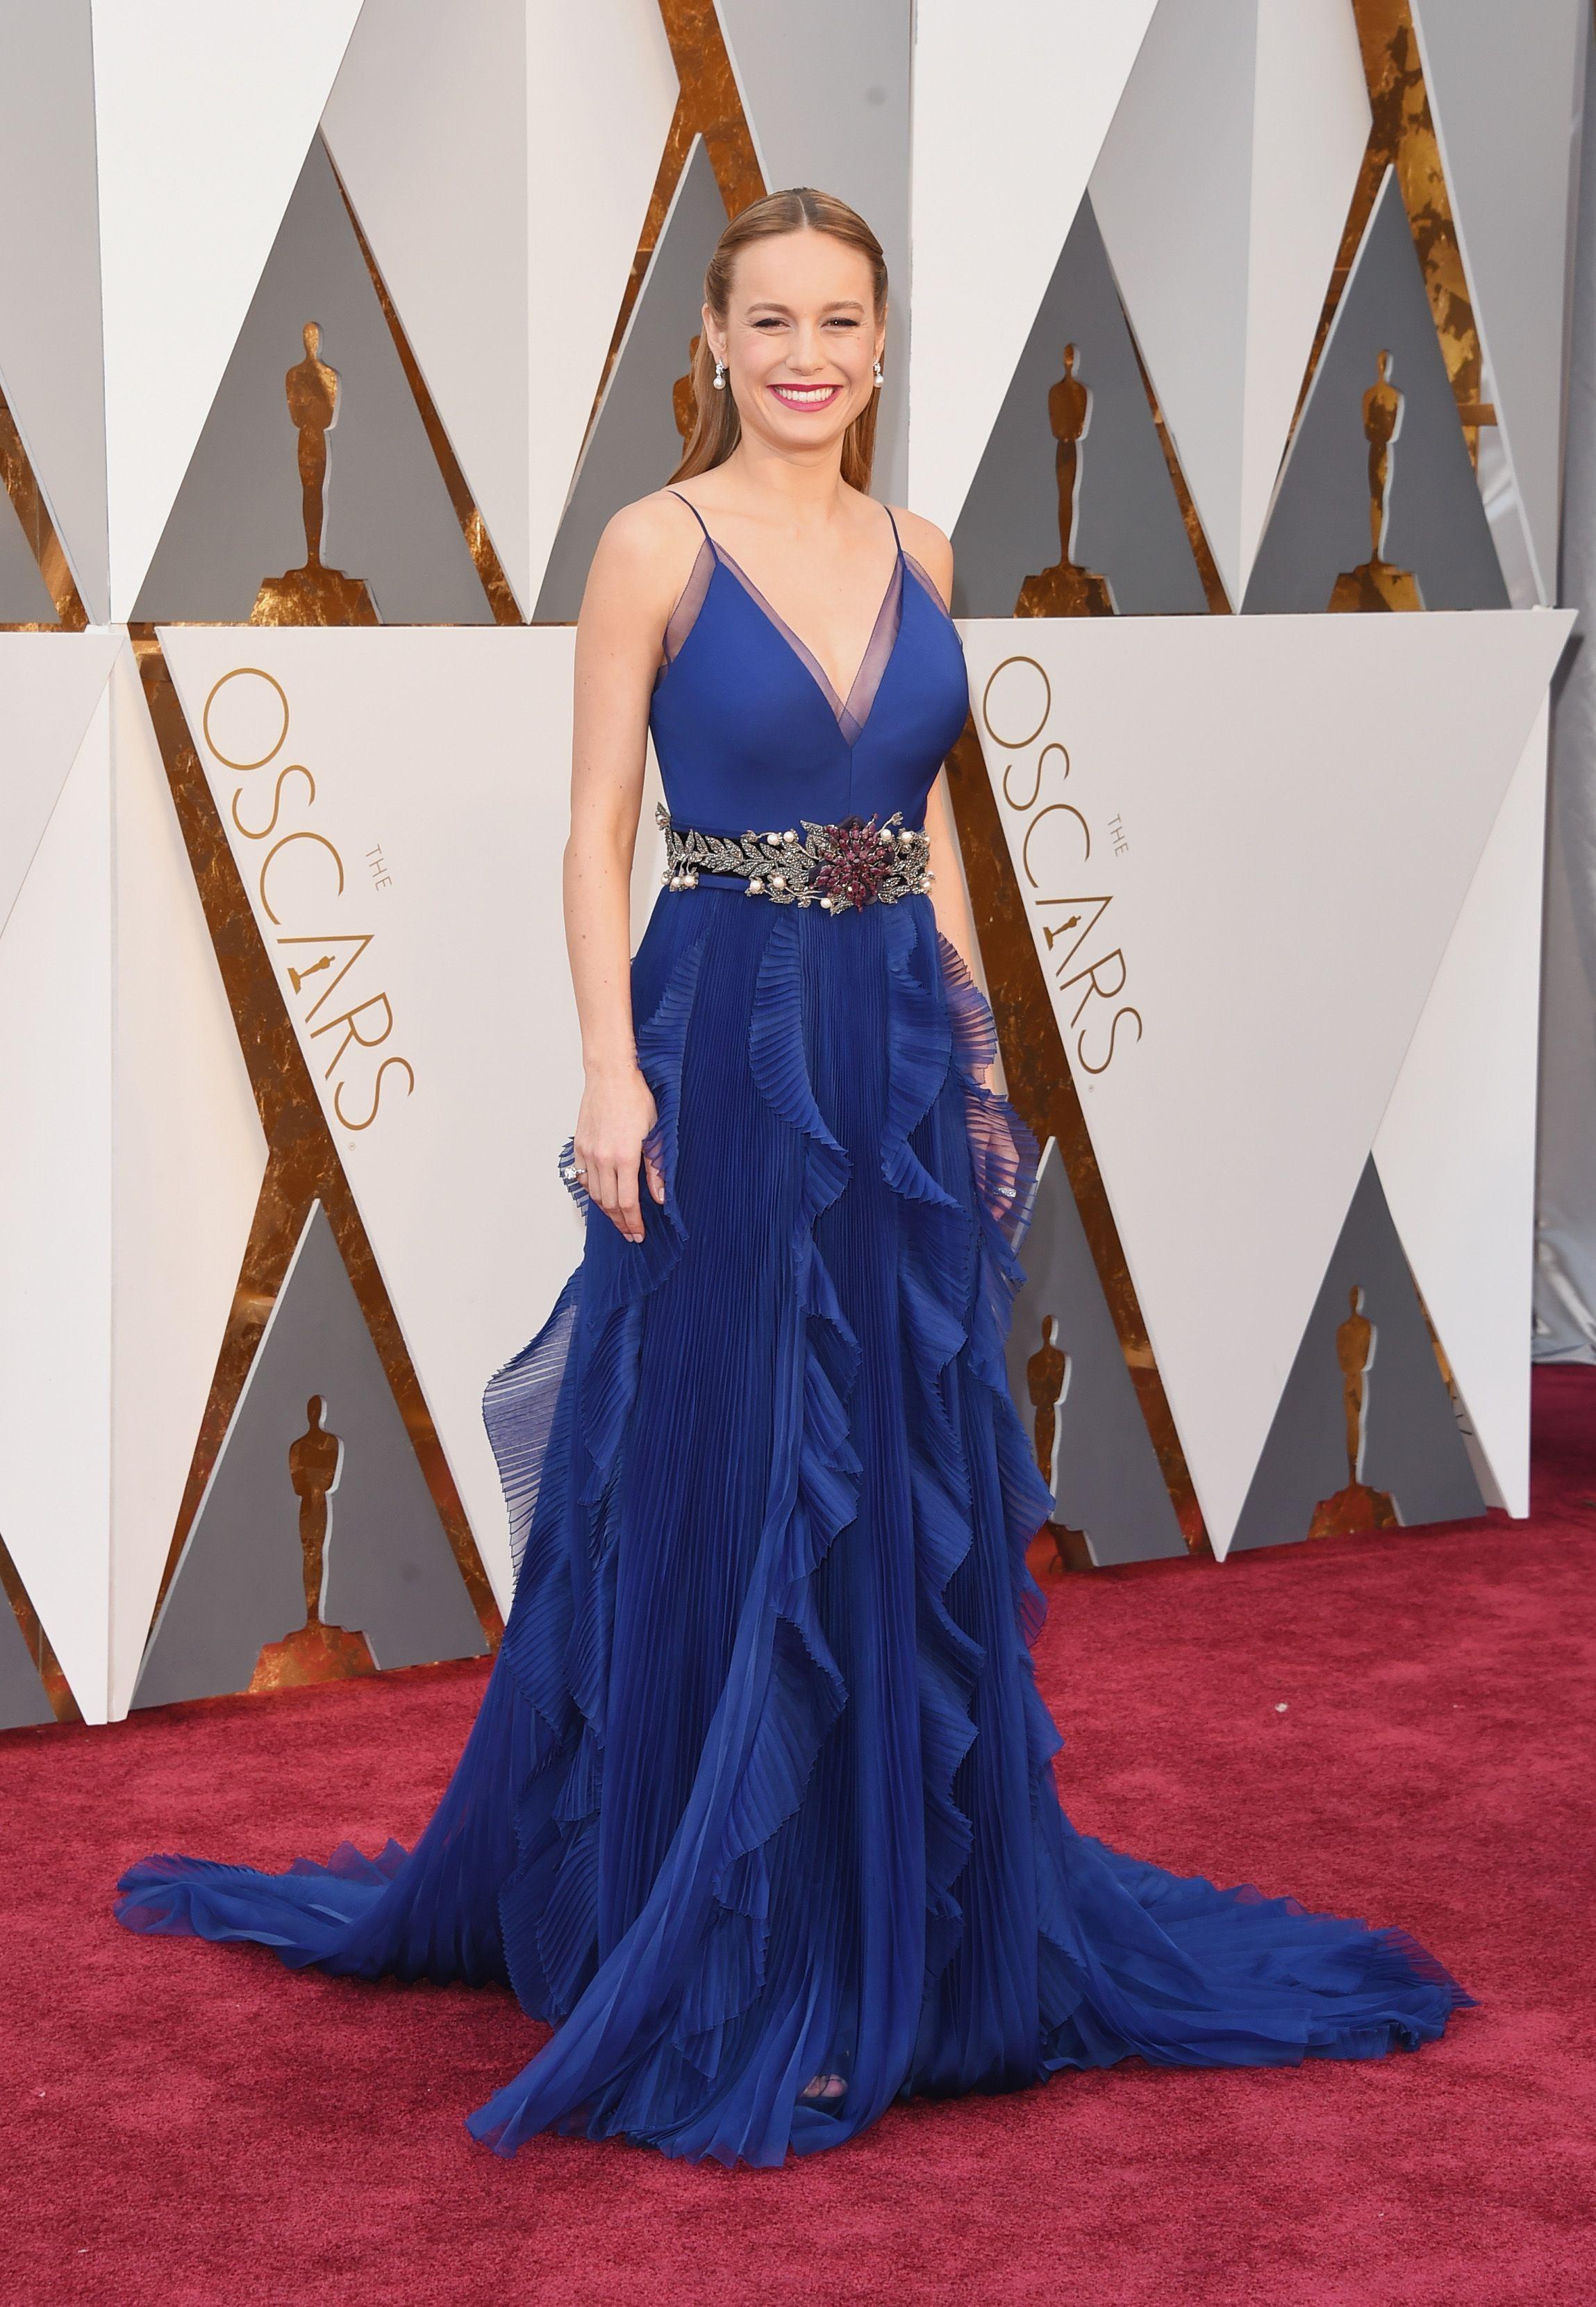 Brie Larson - Oscars Red Carpet Arrivals: Oscars Red Carpet Arrivals ...